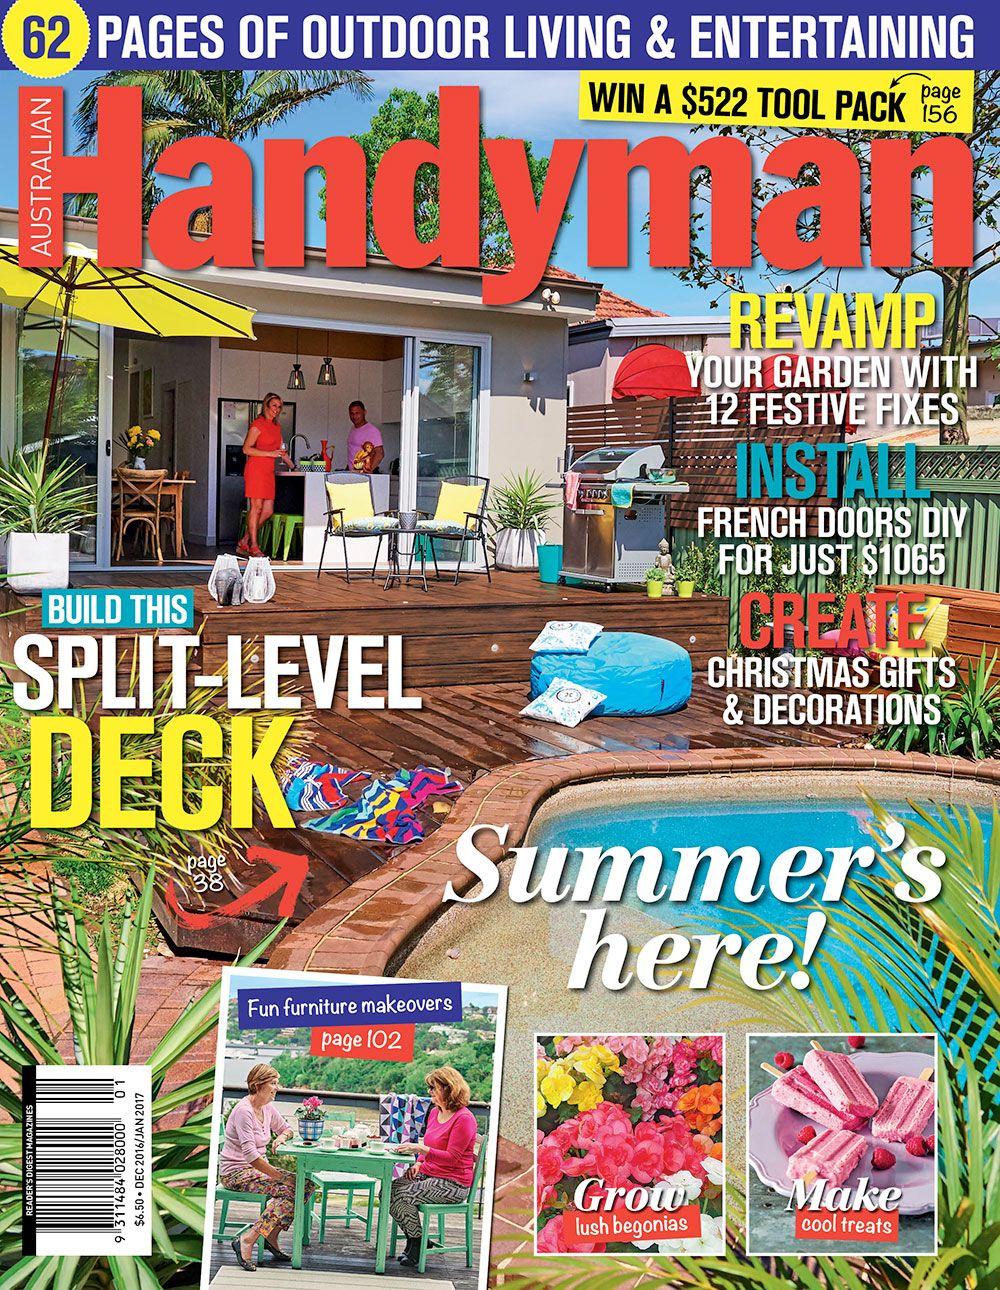 Australian Handyman Magazine December 2016 /January 2017